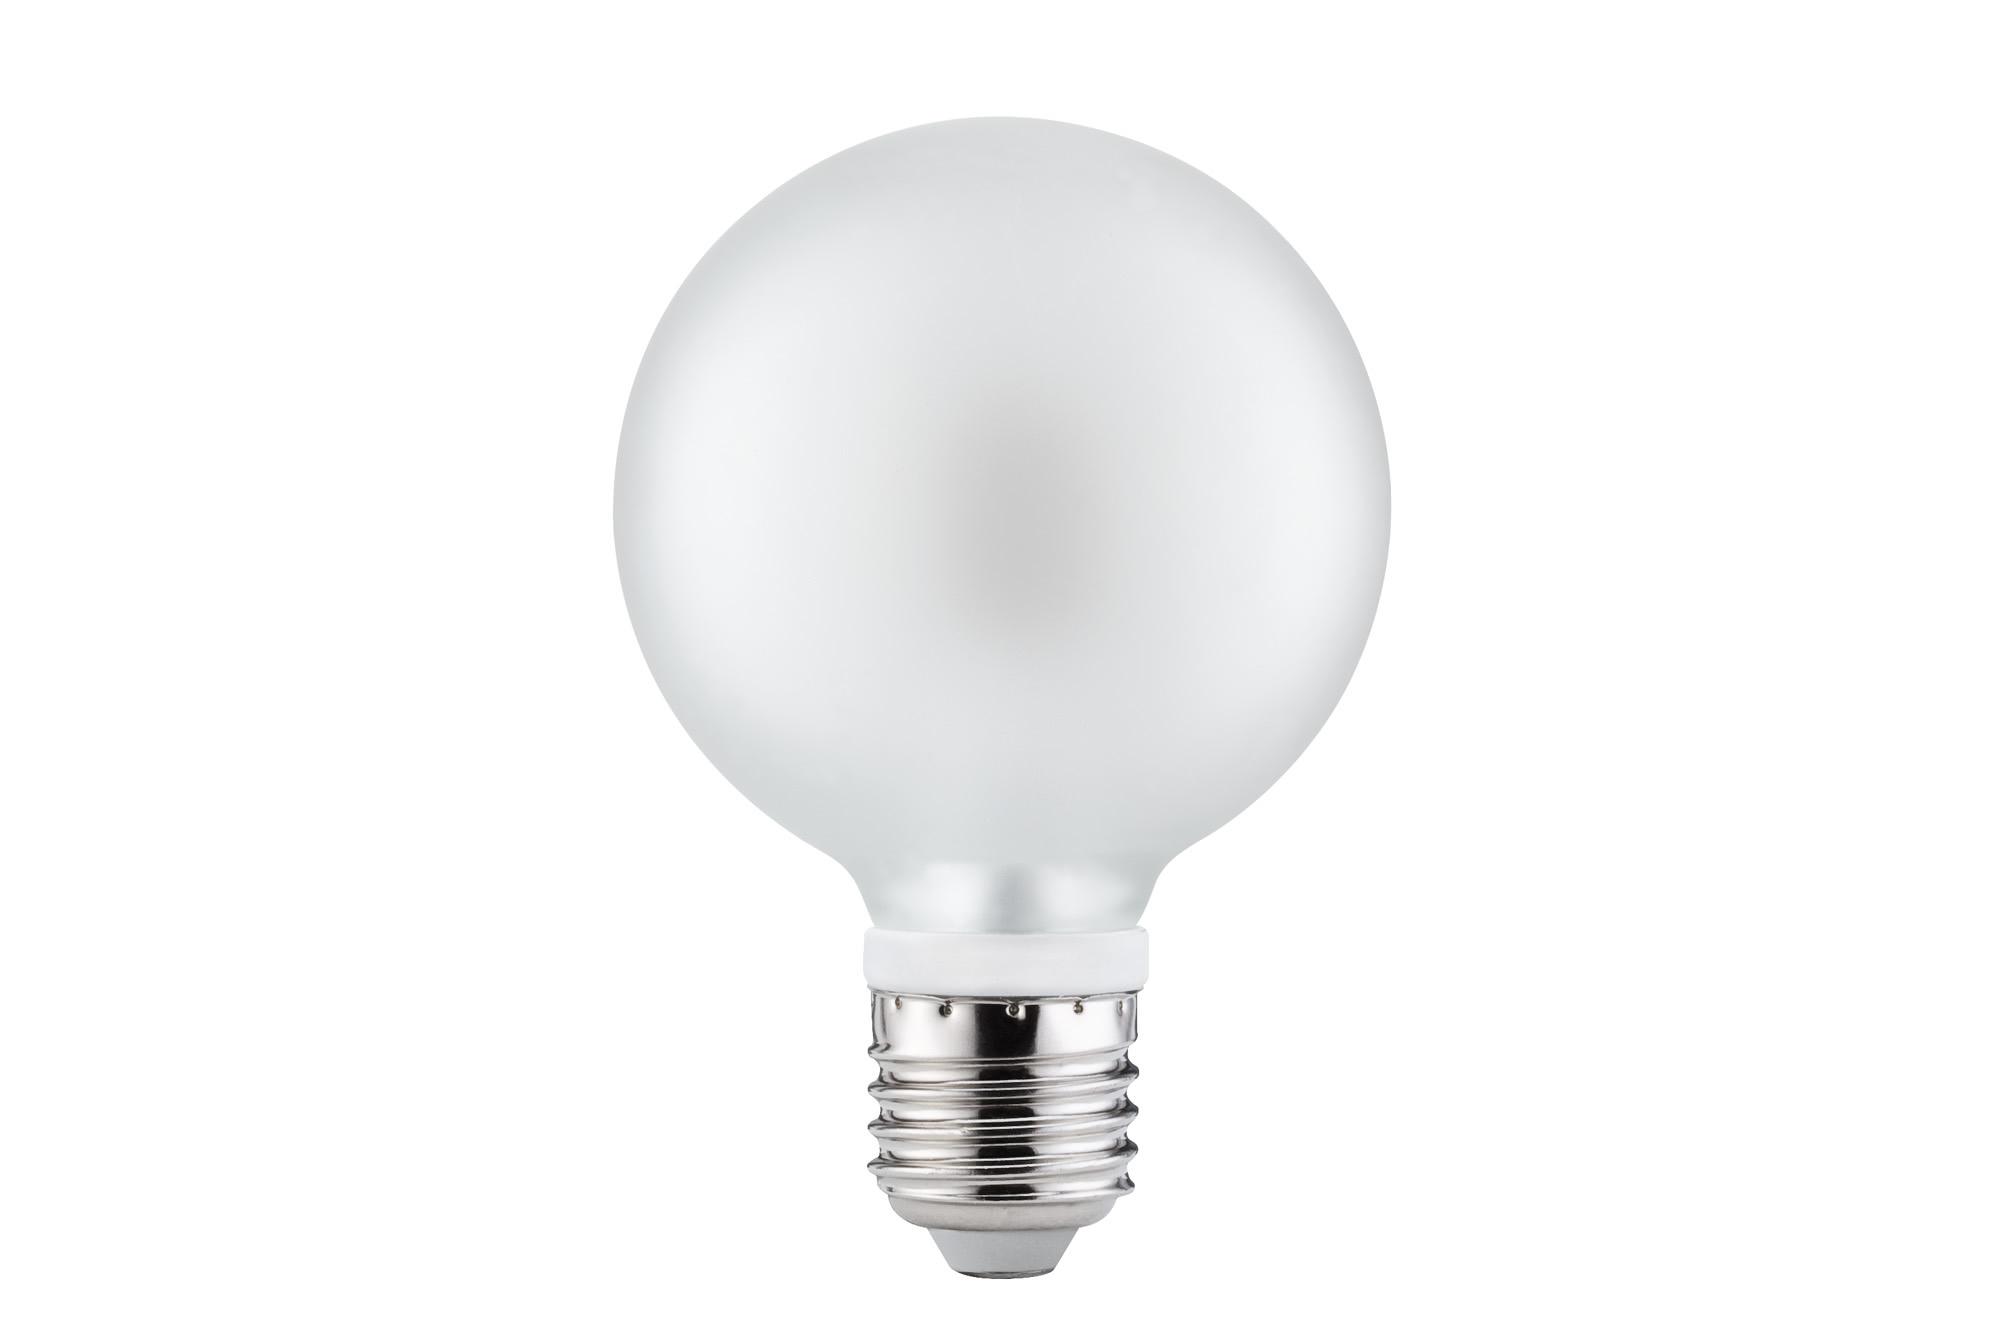 Paulmann. 28279 LED Globe 80 7W E27 Satin 2700K